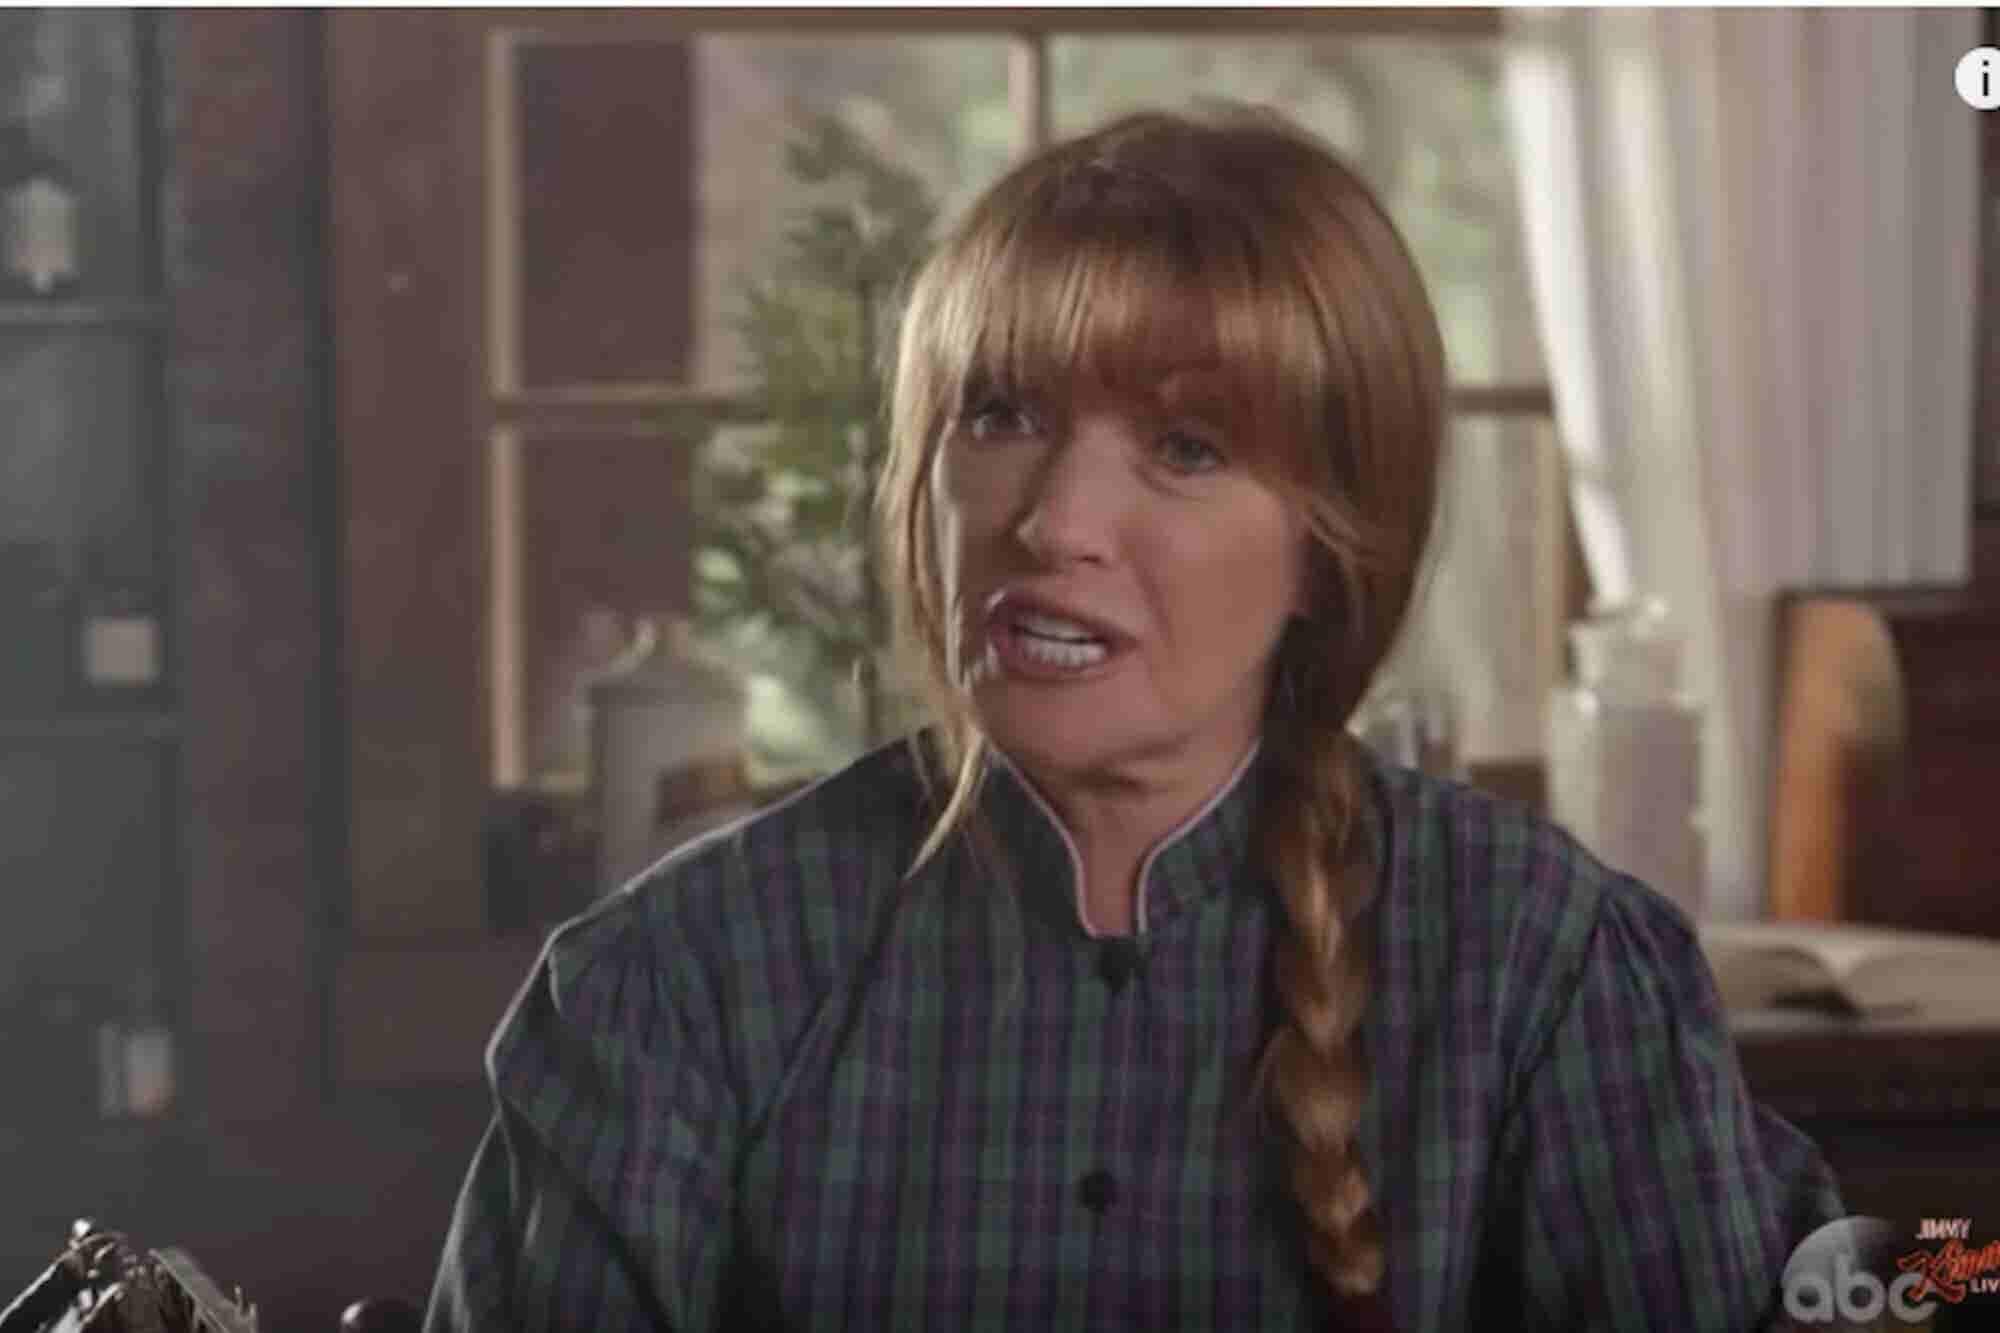 Jimmy Kimmel's 'Dr. Quinn Medicinal Marijuana Woman' Spoof Is Hilariou...